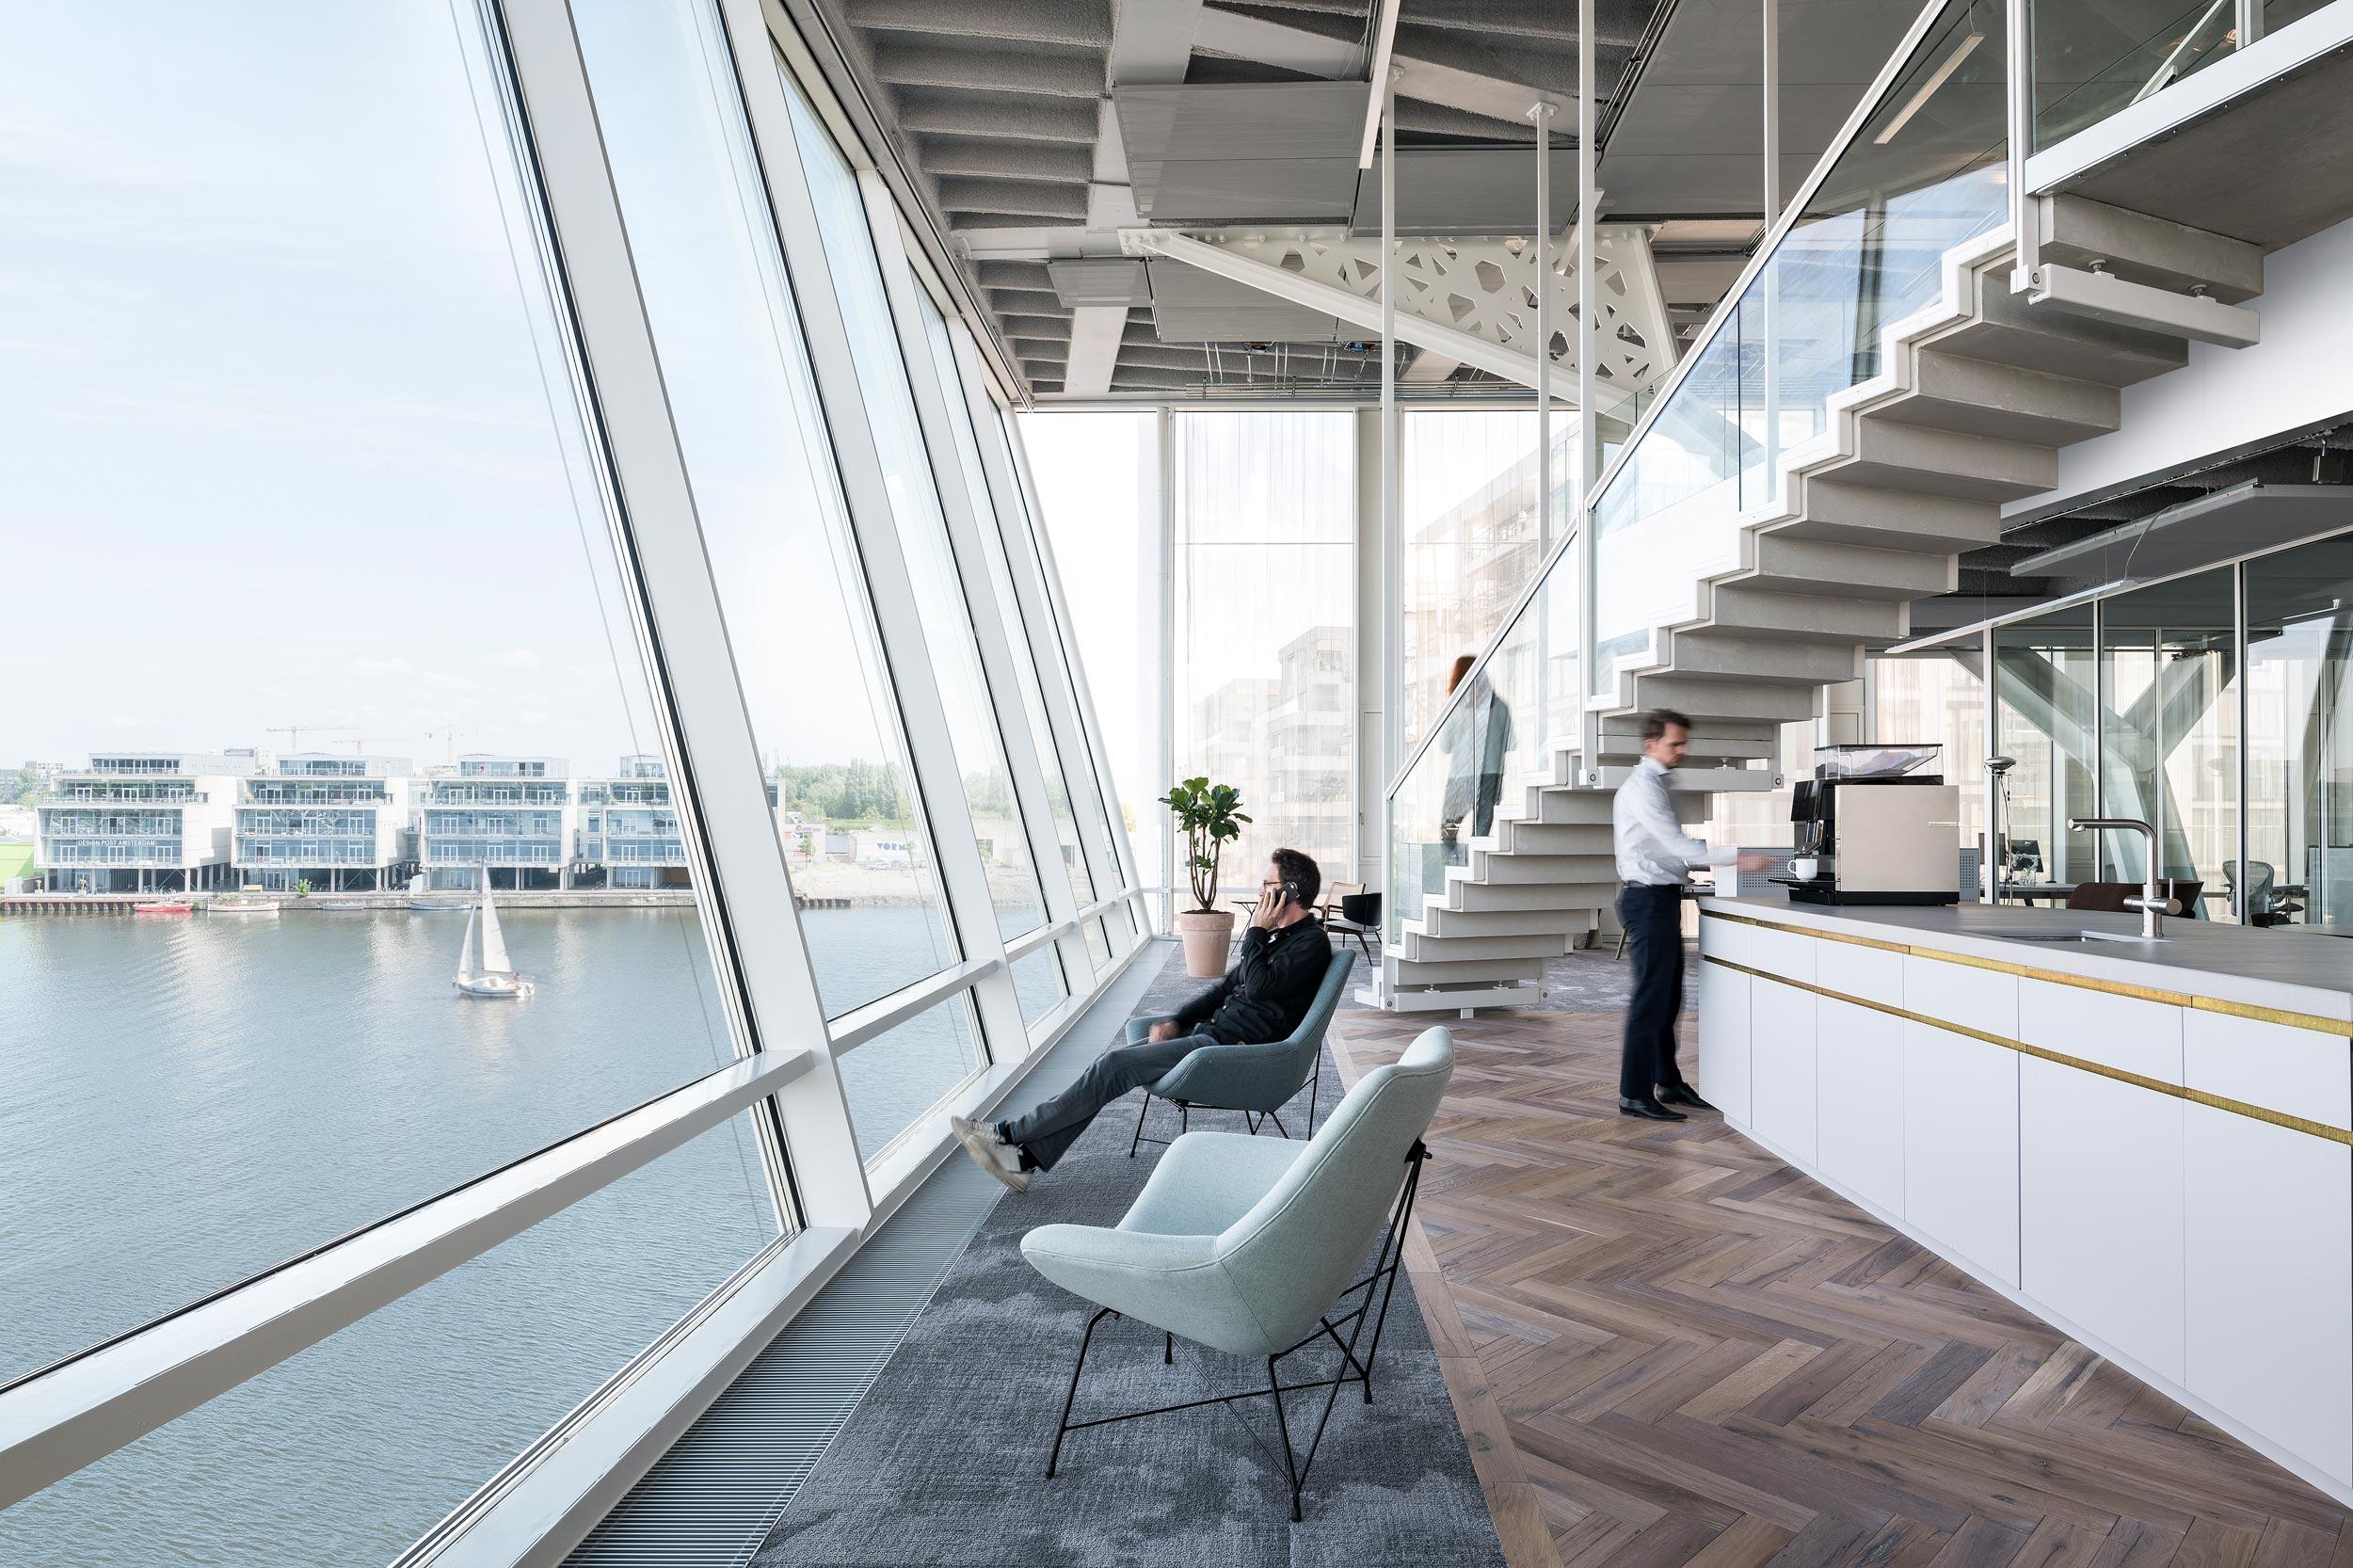 Amvest kantoor interieur Amsterdam - Chiel de Nooyer, interieurfotograaf